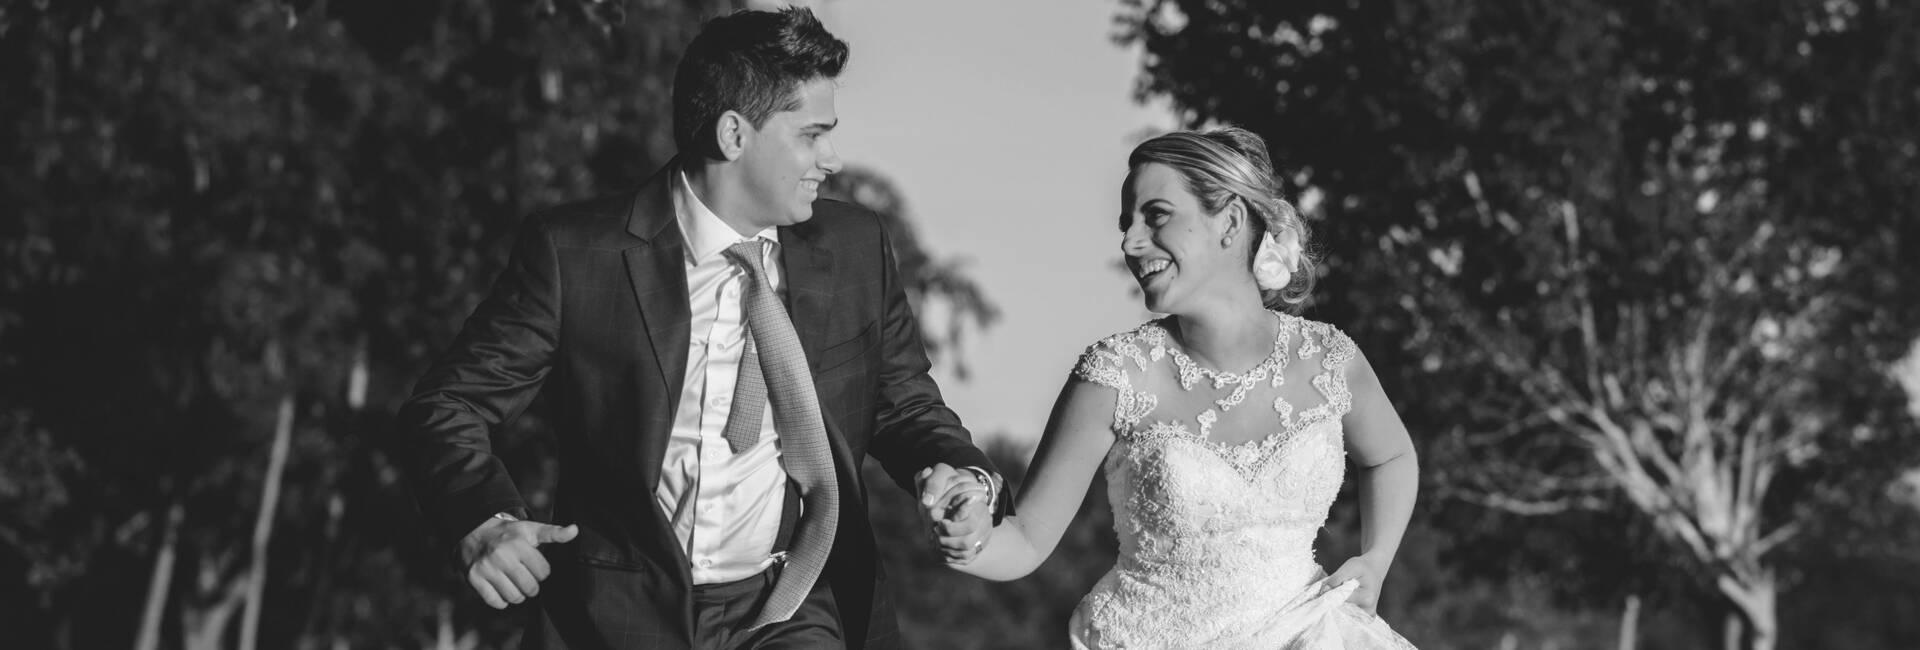 Casamento de Isabella e Emanuel